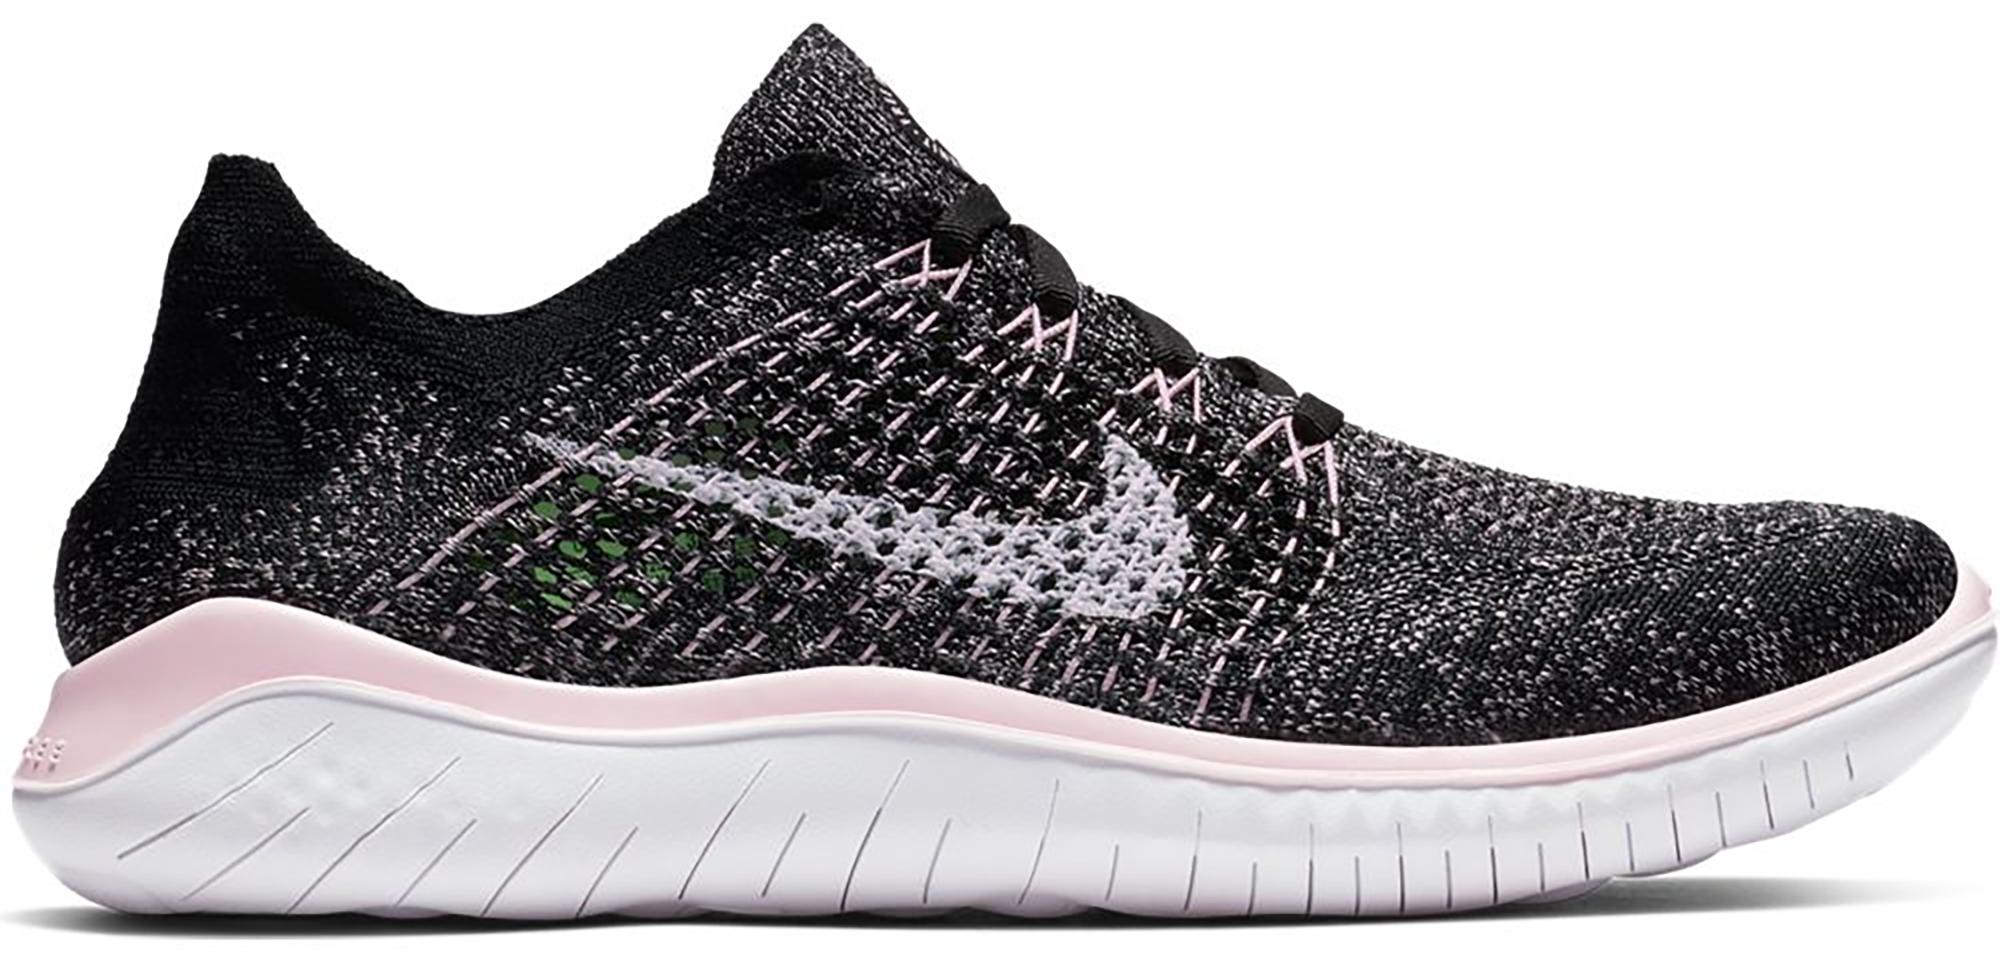 Nike Free RN Flyknit 2018 Black Pink